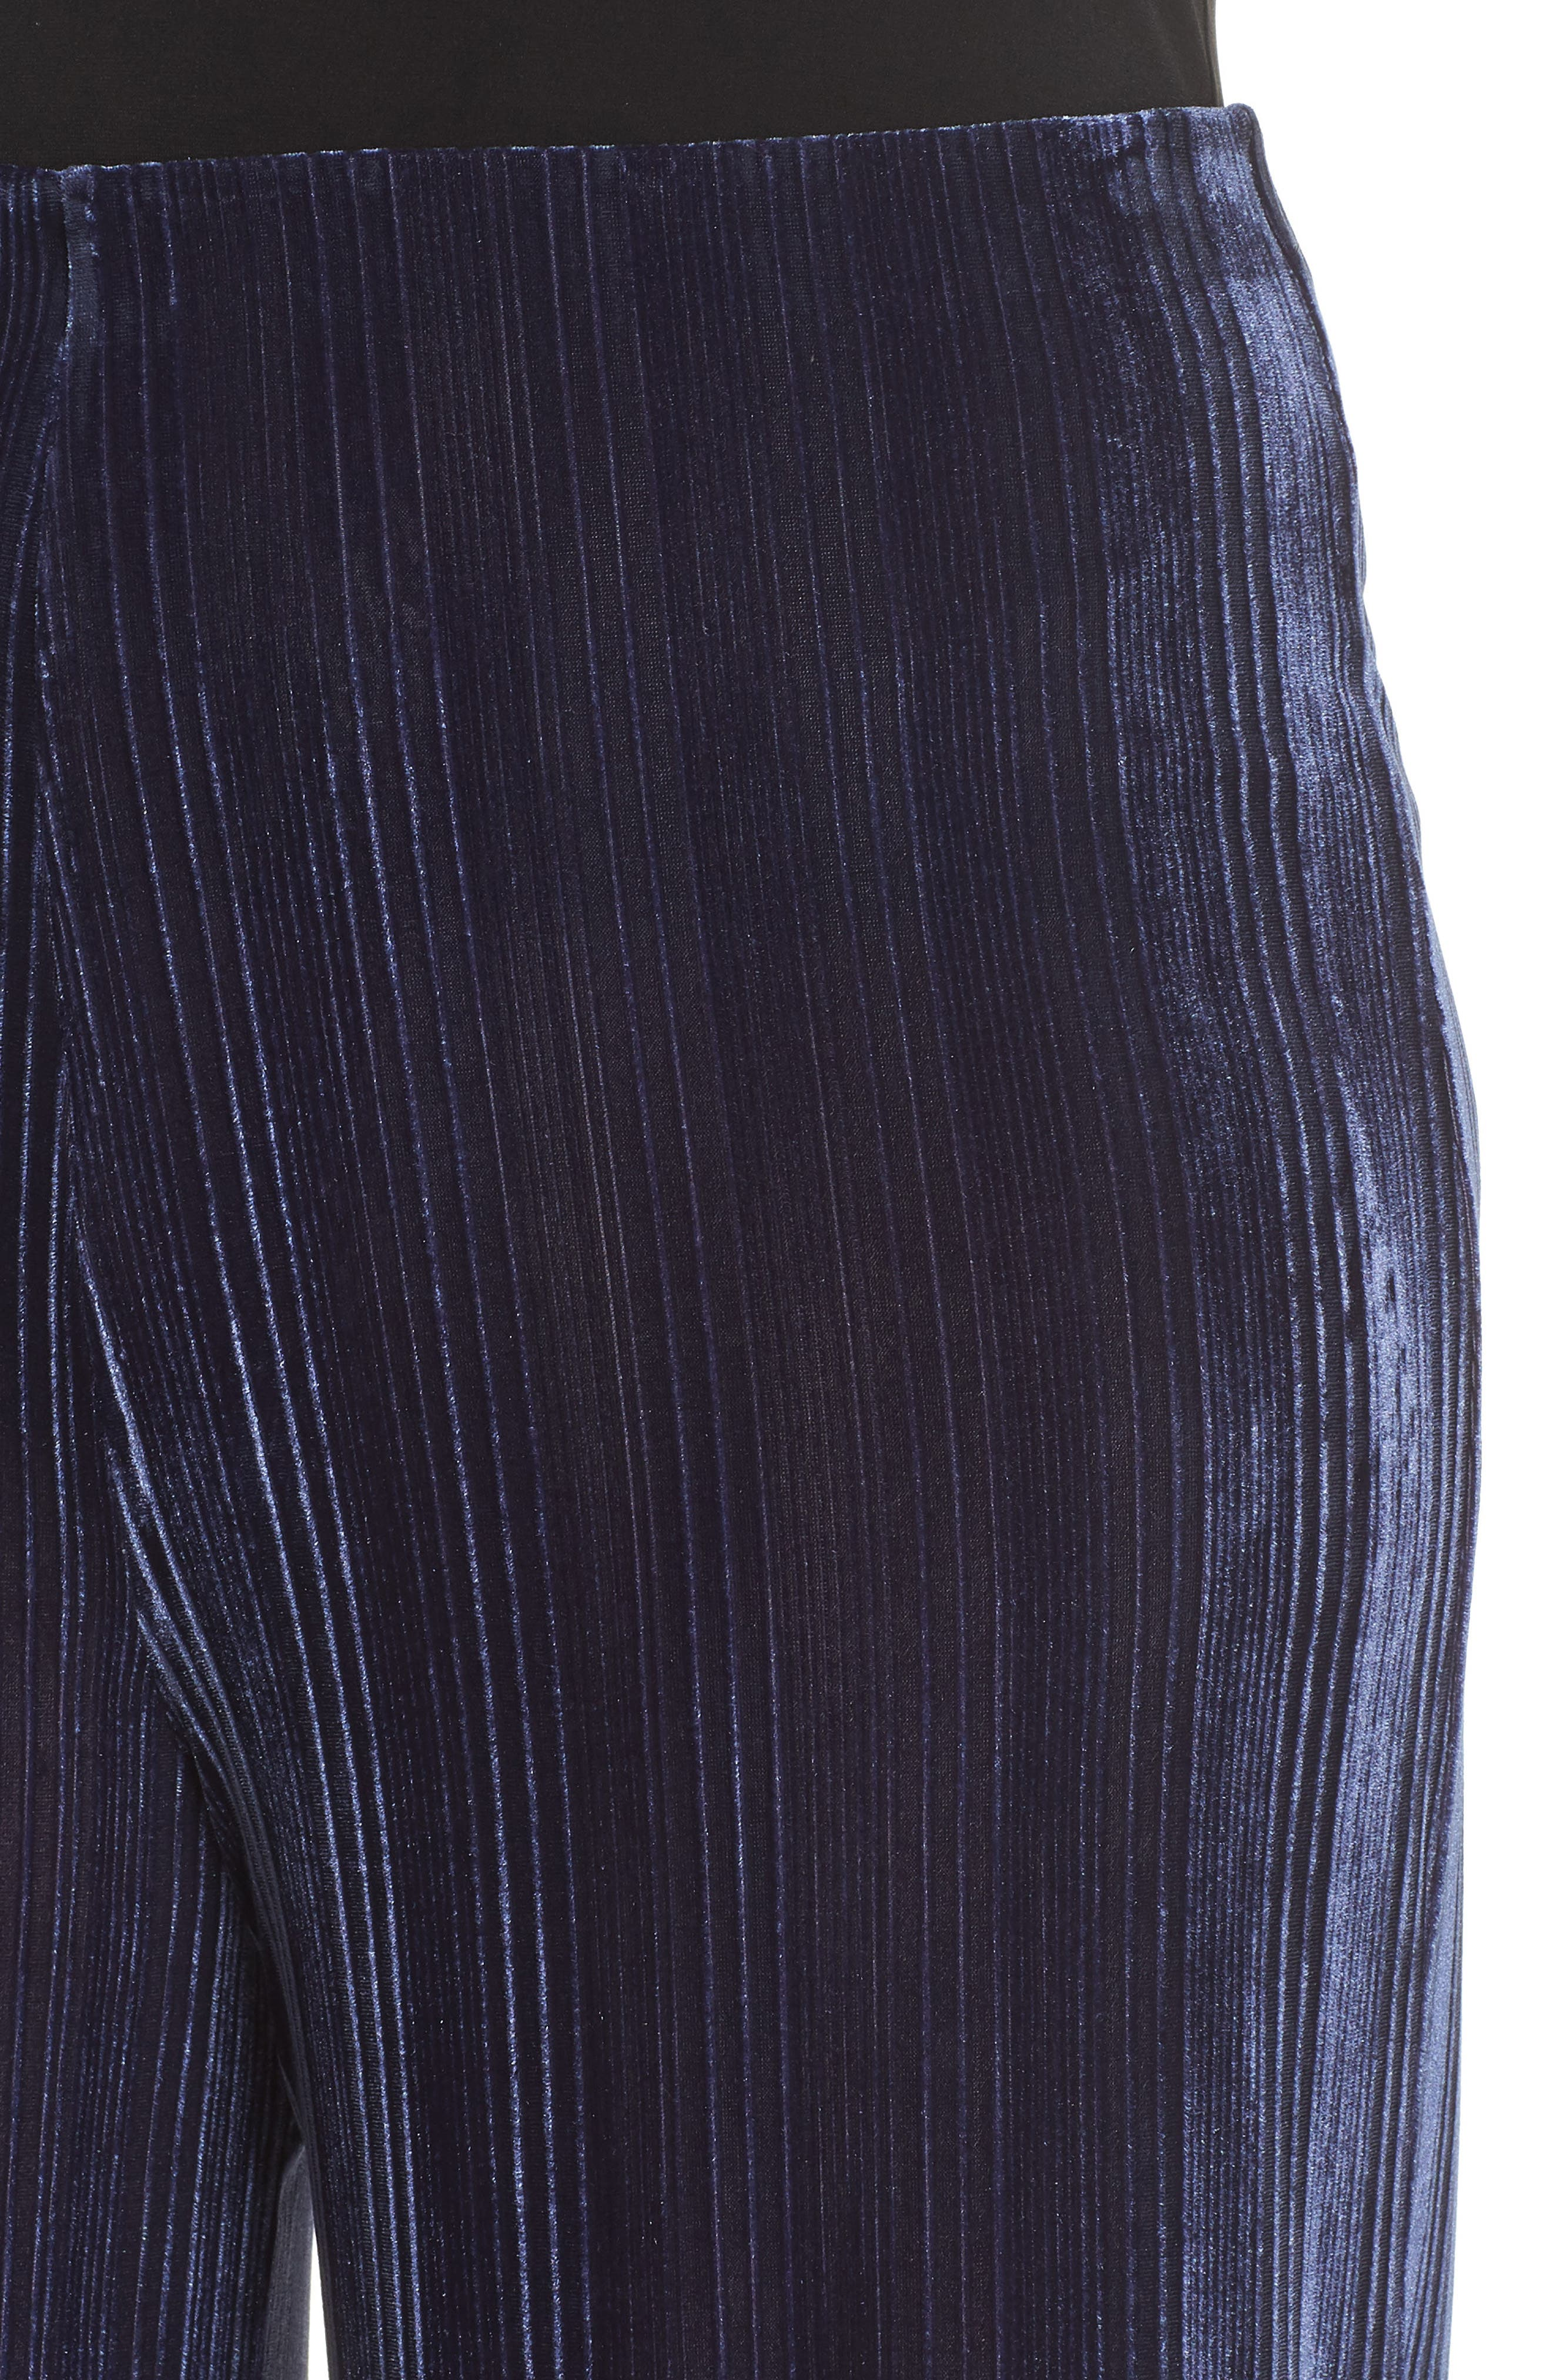 High Rise Velour Wide Leg Crop Pants,                             Alternate thumbnail 4, color,                             NAVY MARITIME